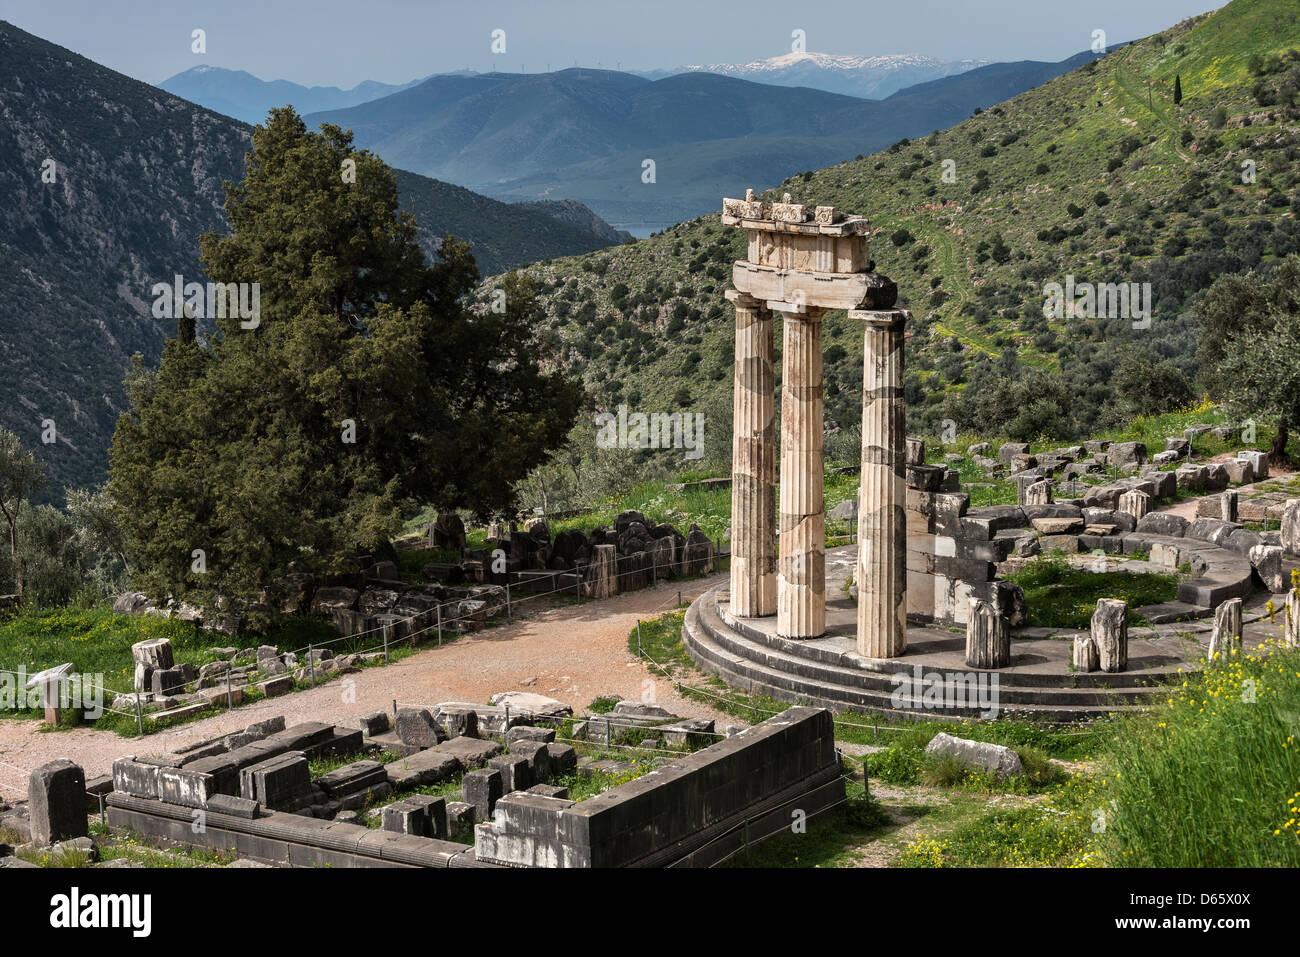 The circular Tholos at the Temple of Athena Pronaia, Ancient Delphi, Thessaly, Greece. Stock Photo